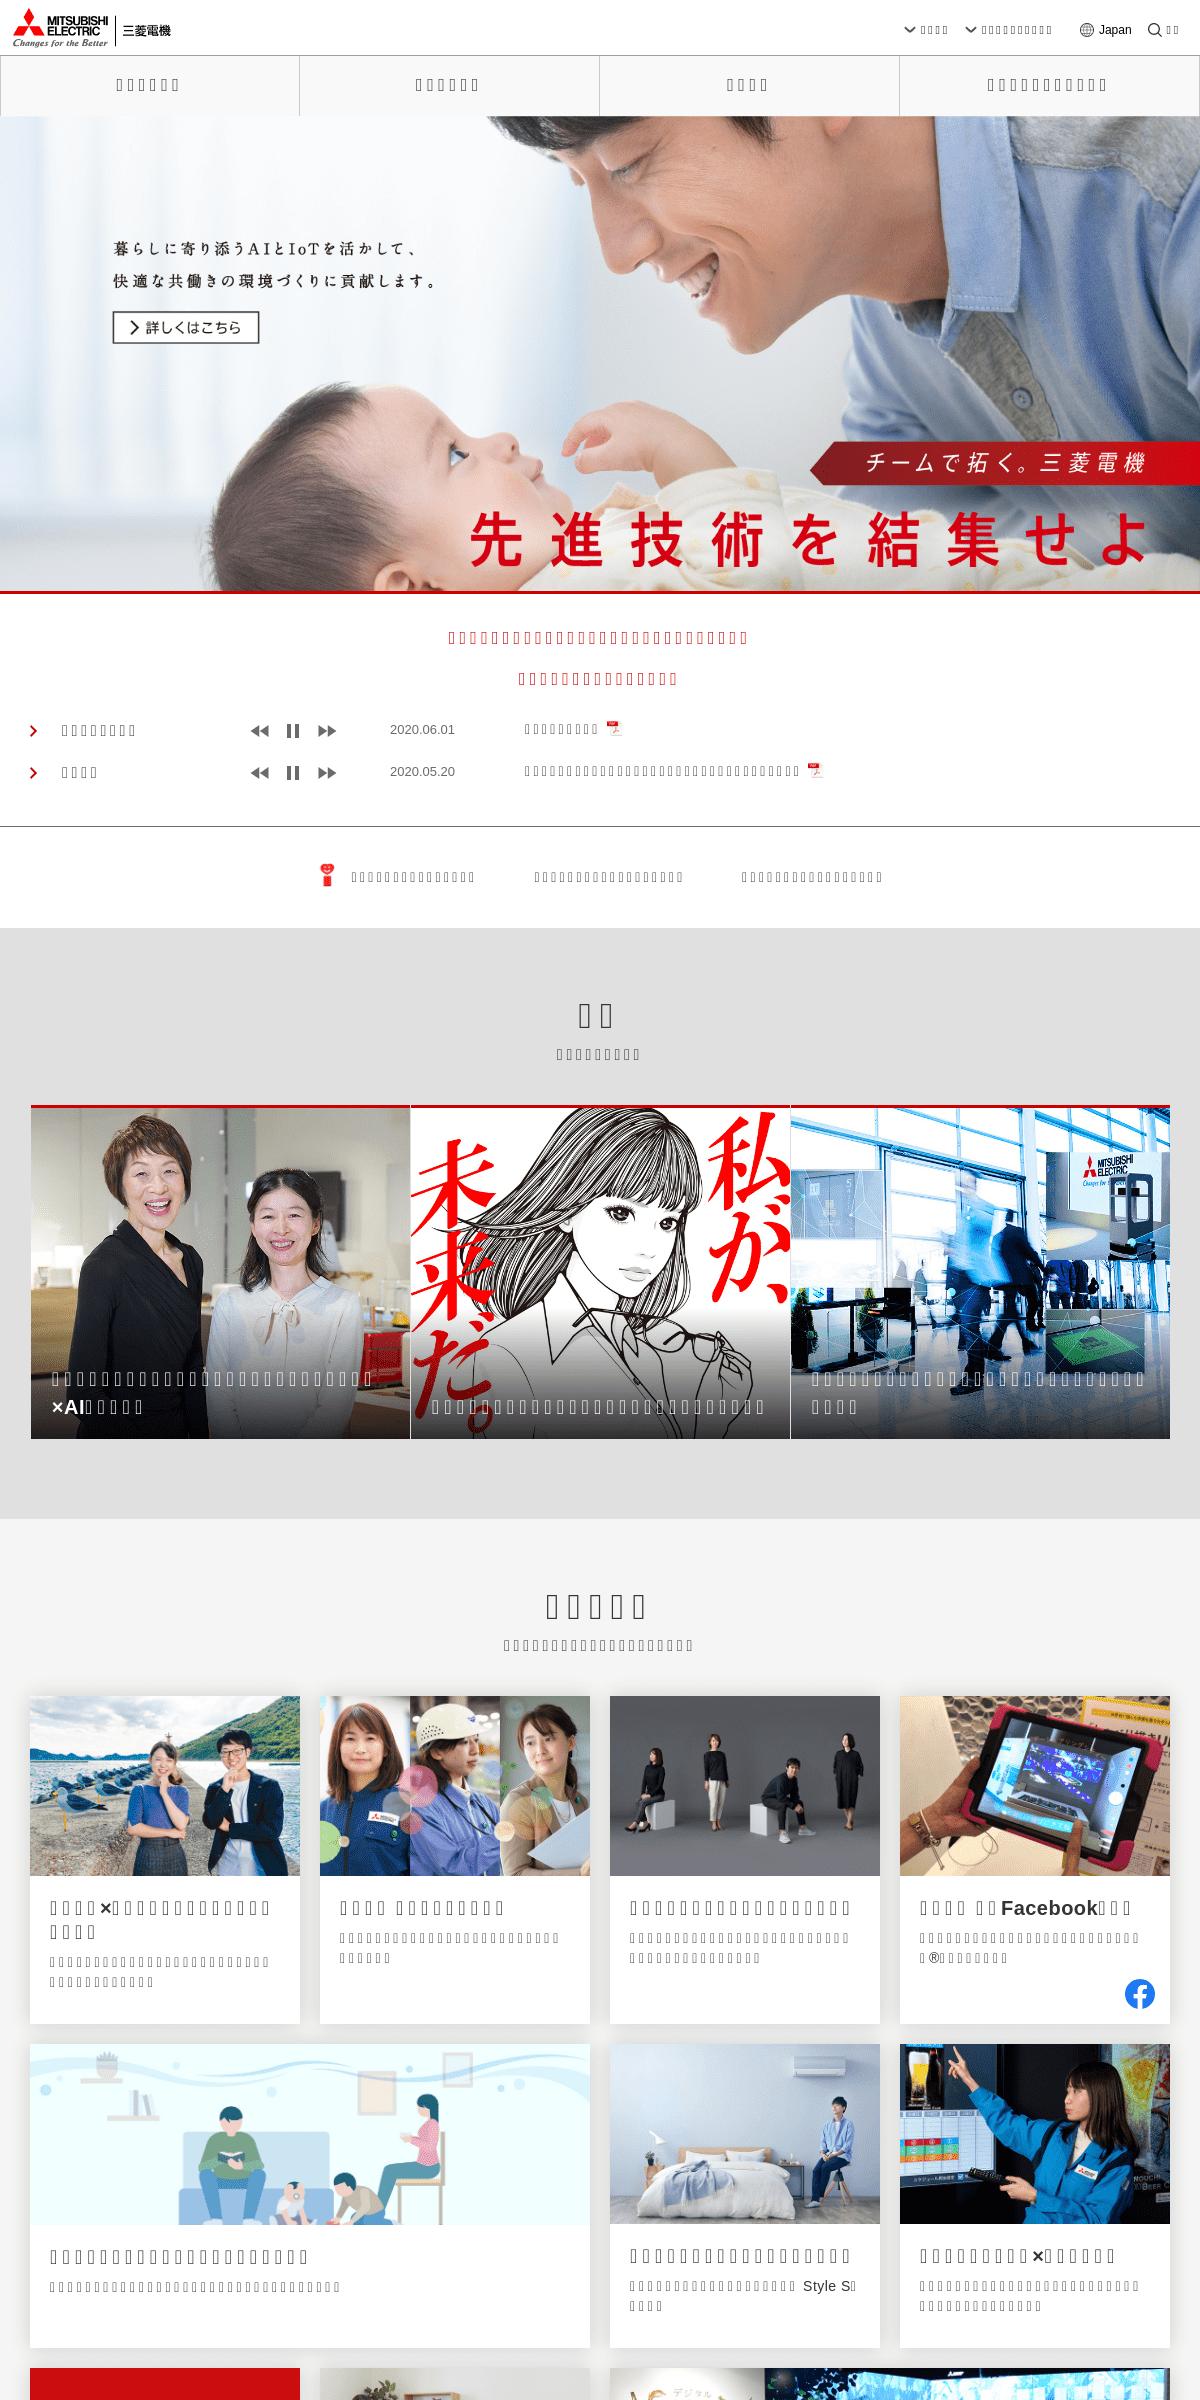 ArchiveBay.com - mitsubishielectric.co.jp - 三菱電機 Mitsubishi Electric